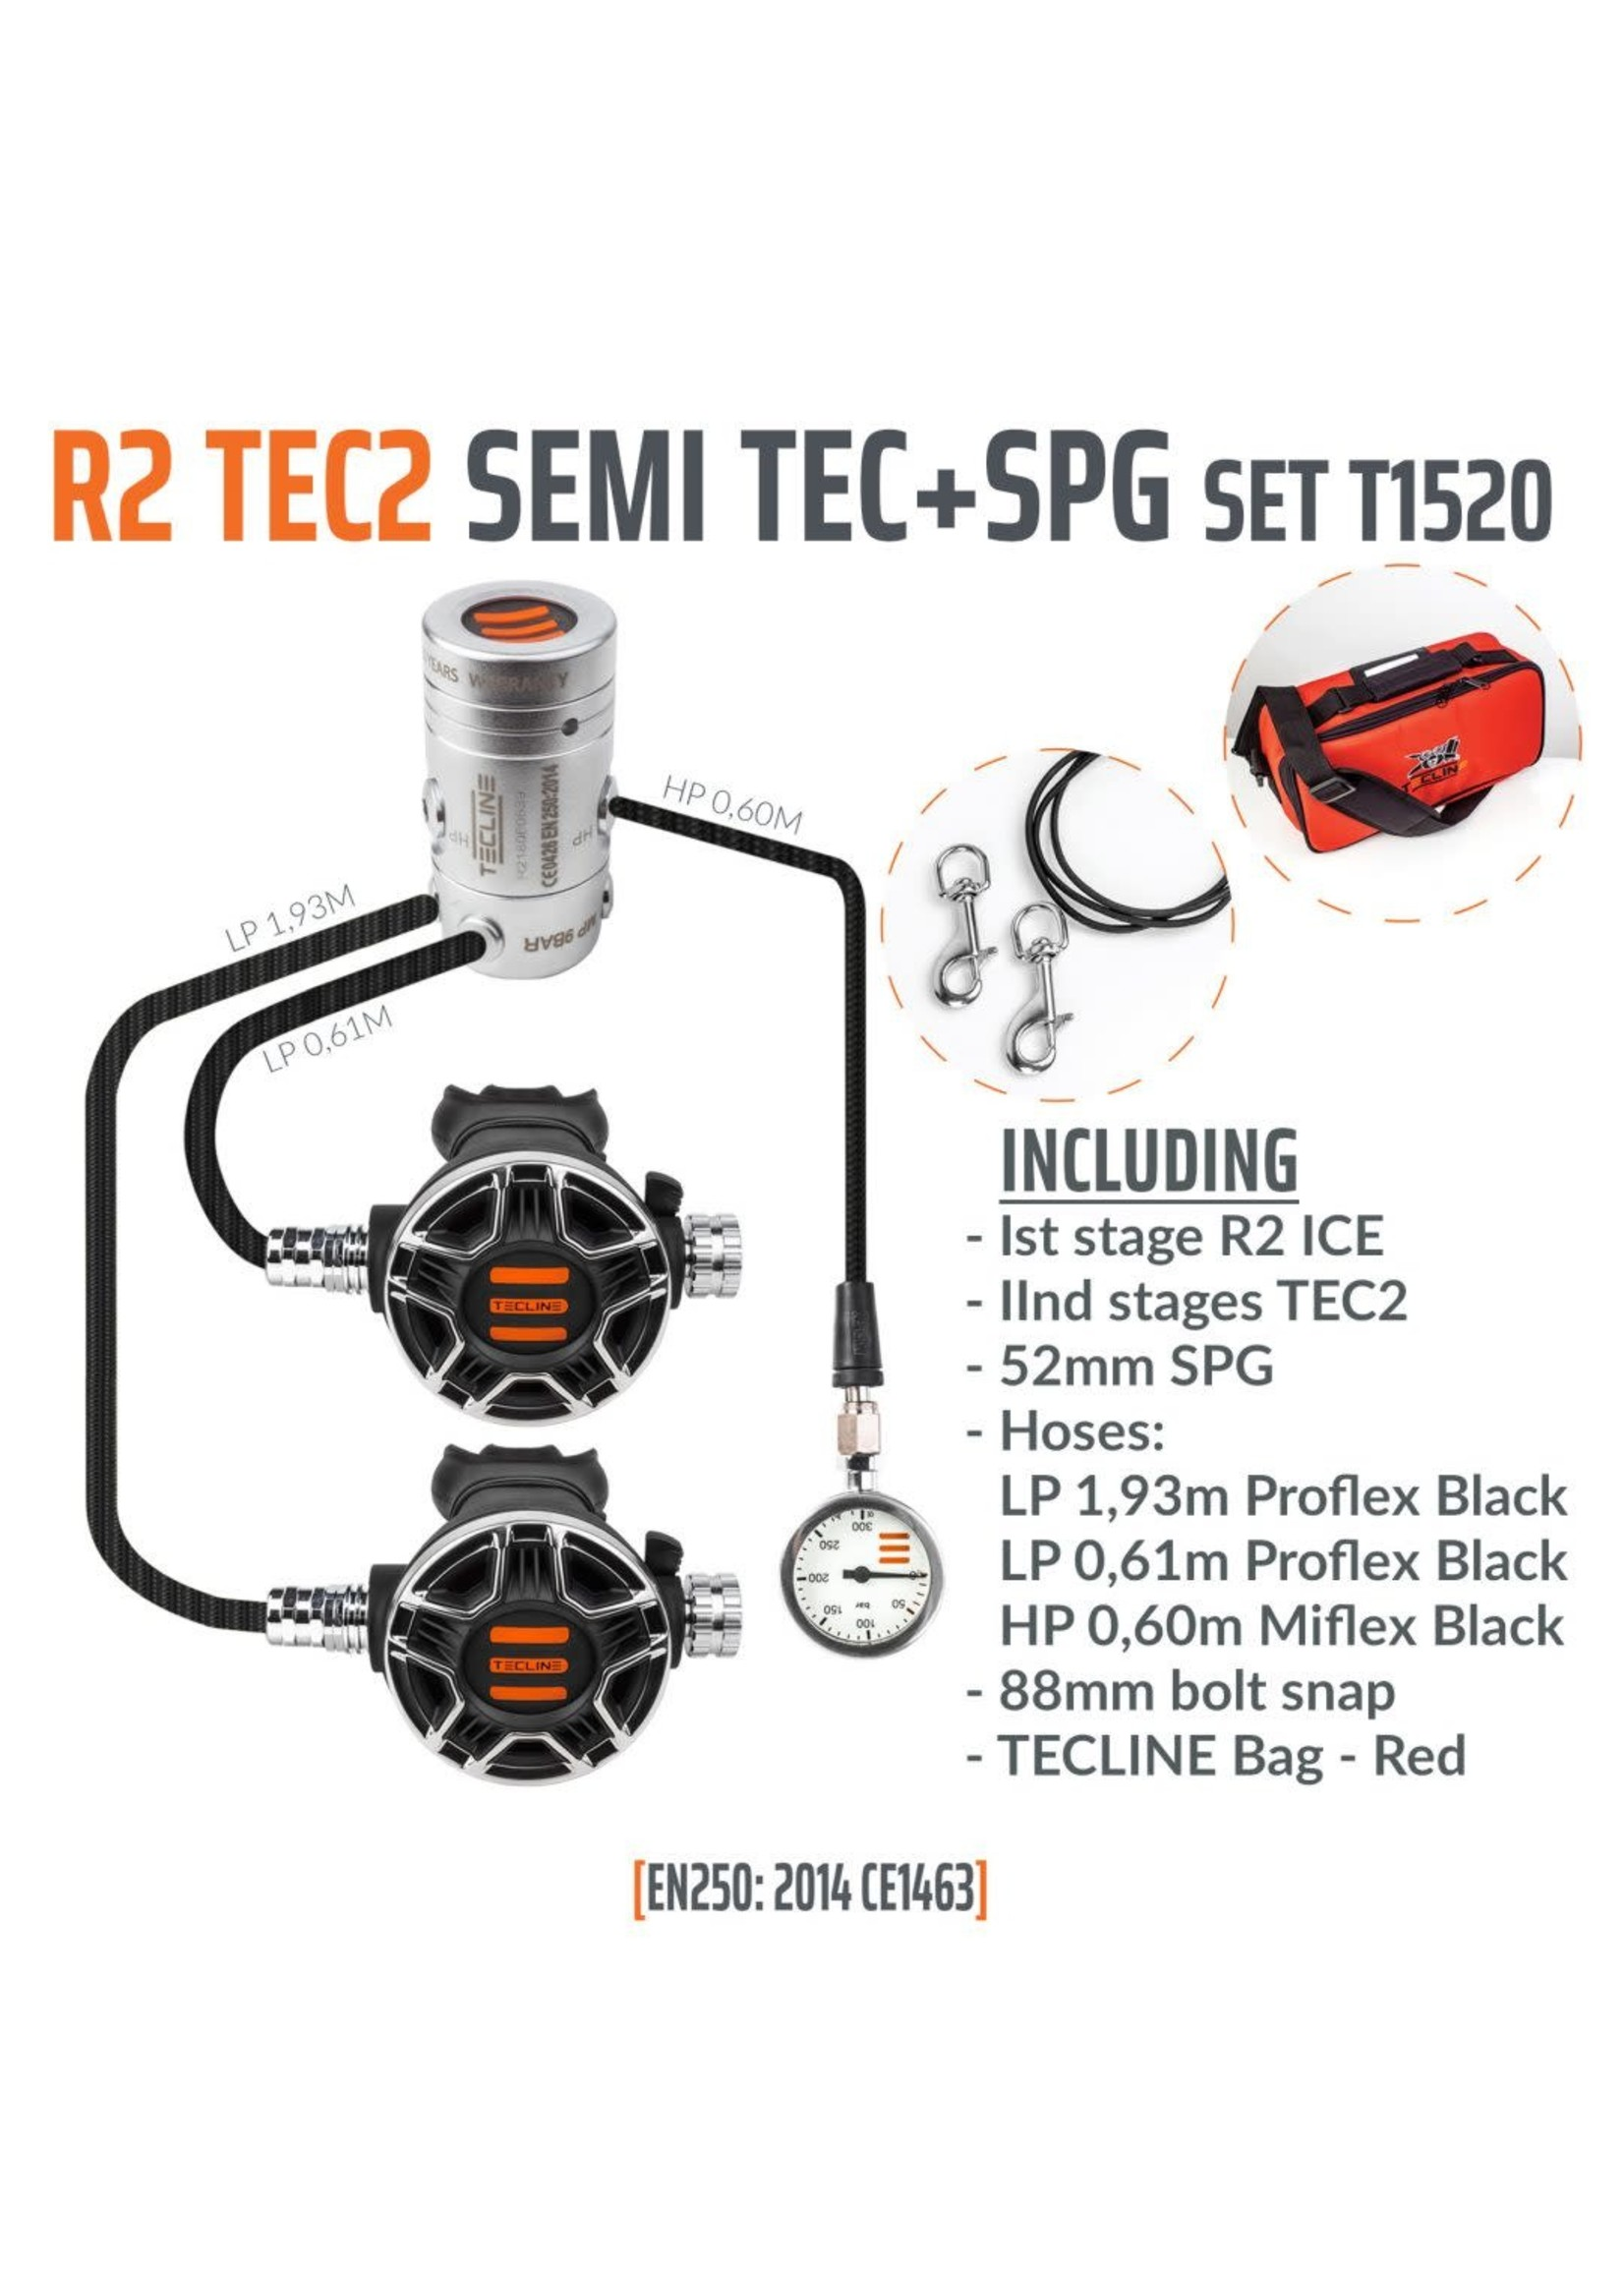 TecLine Tecline R2  TEC2 Semi TEC + Mano set